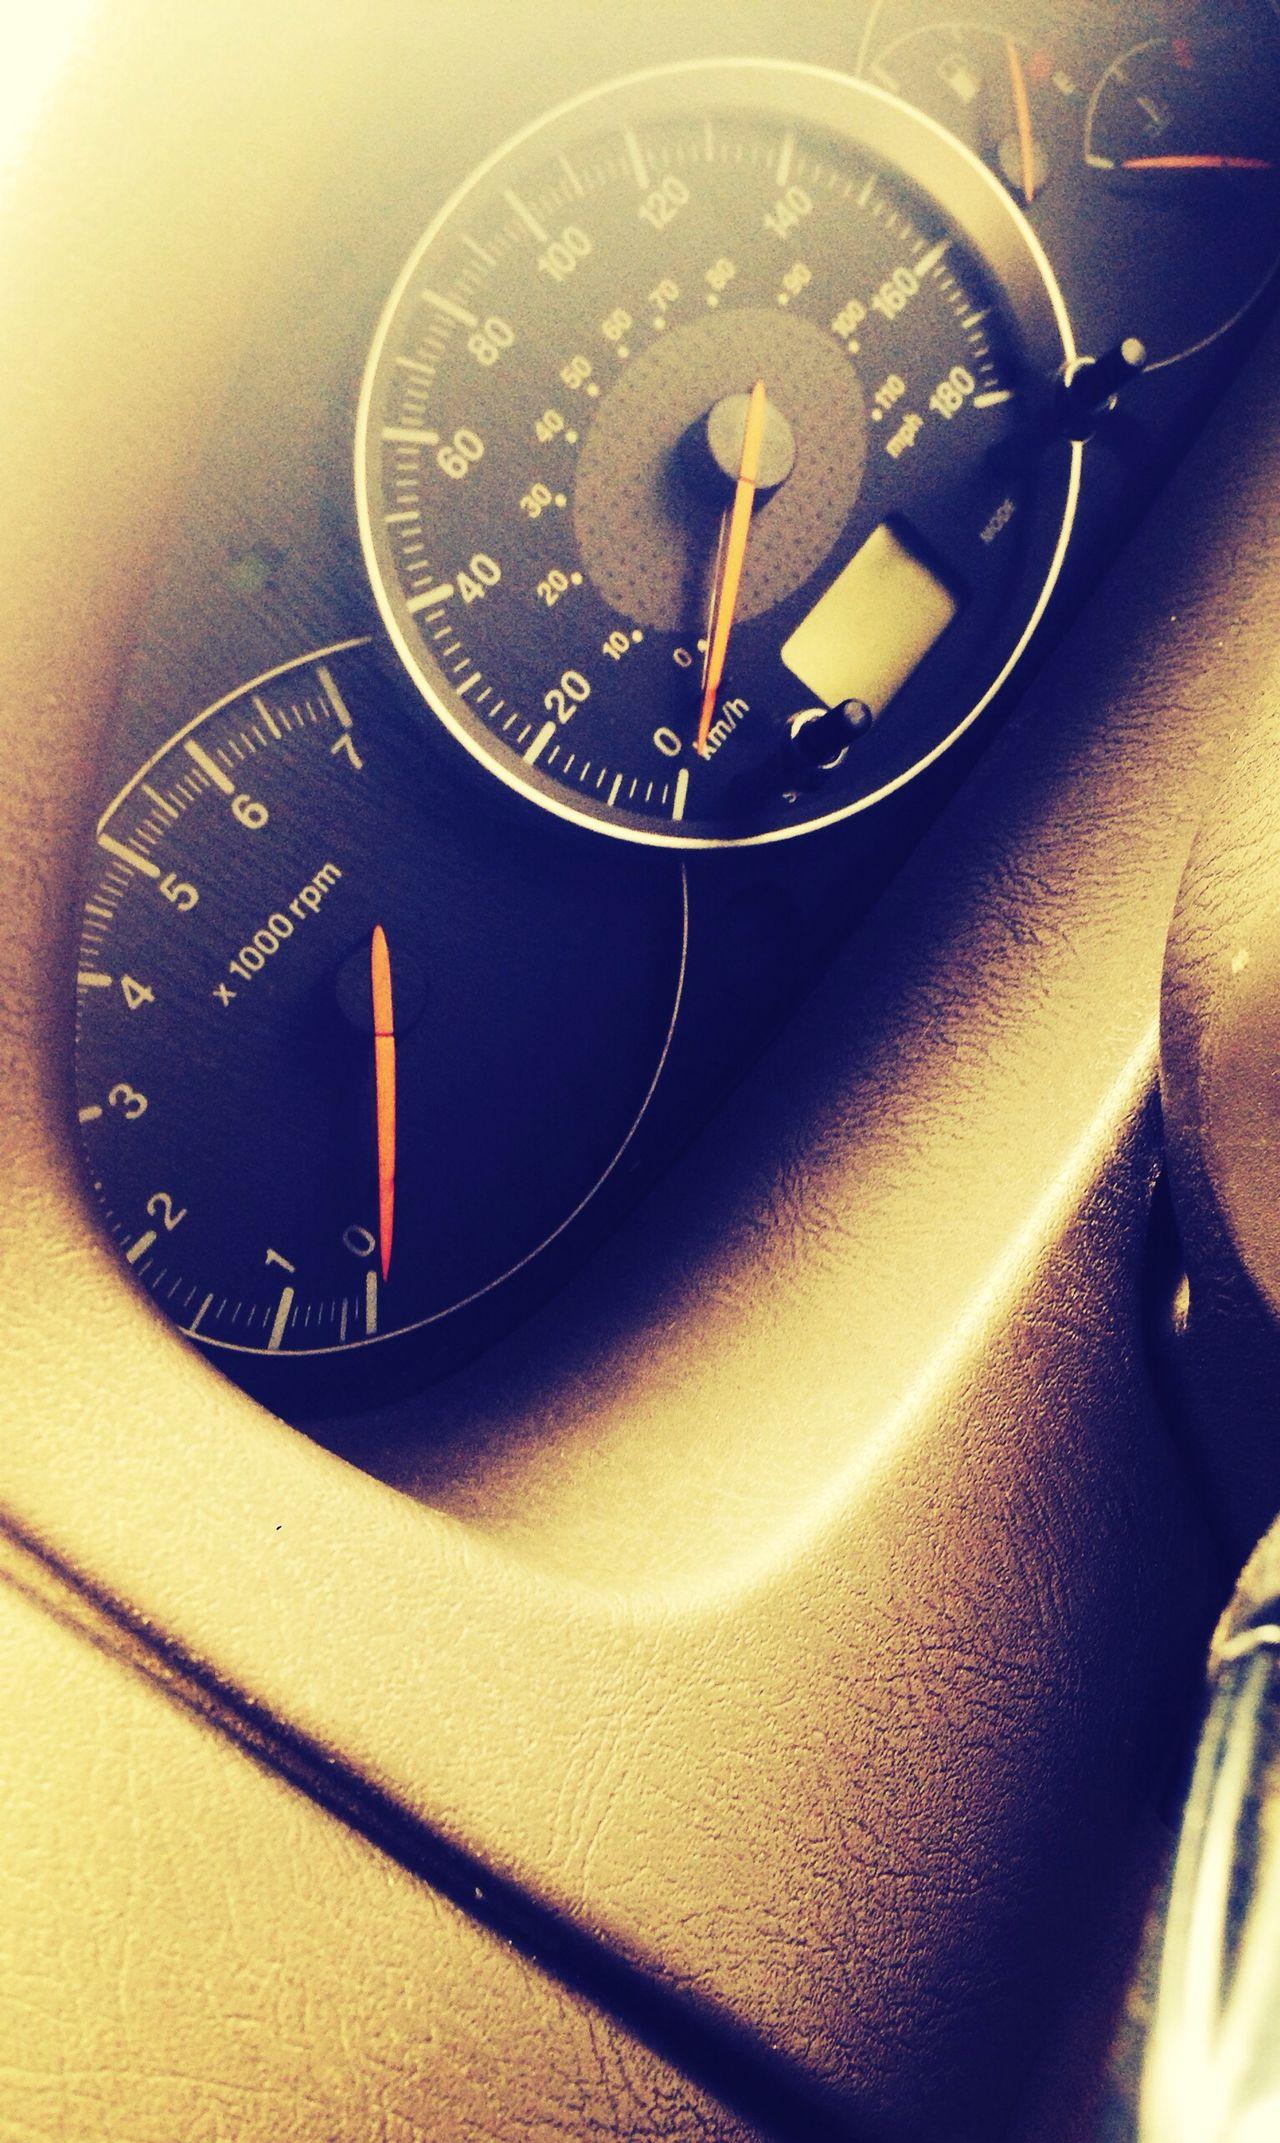 Vroom Vroom yeahhhh speed!!! Adrenaline!!!